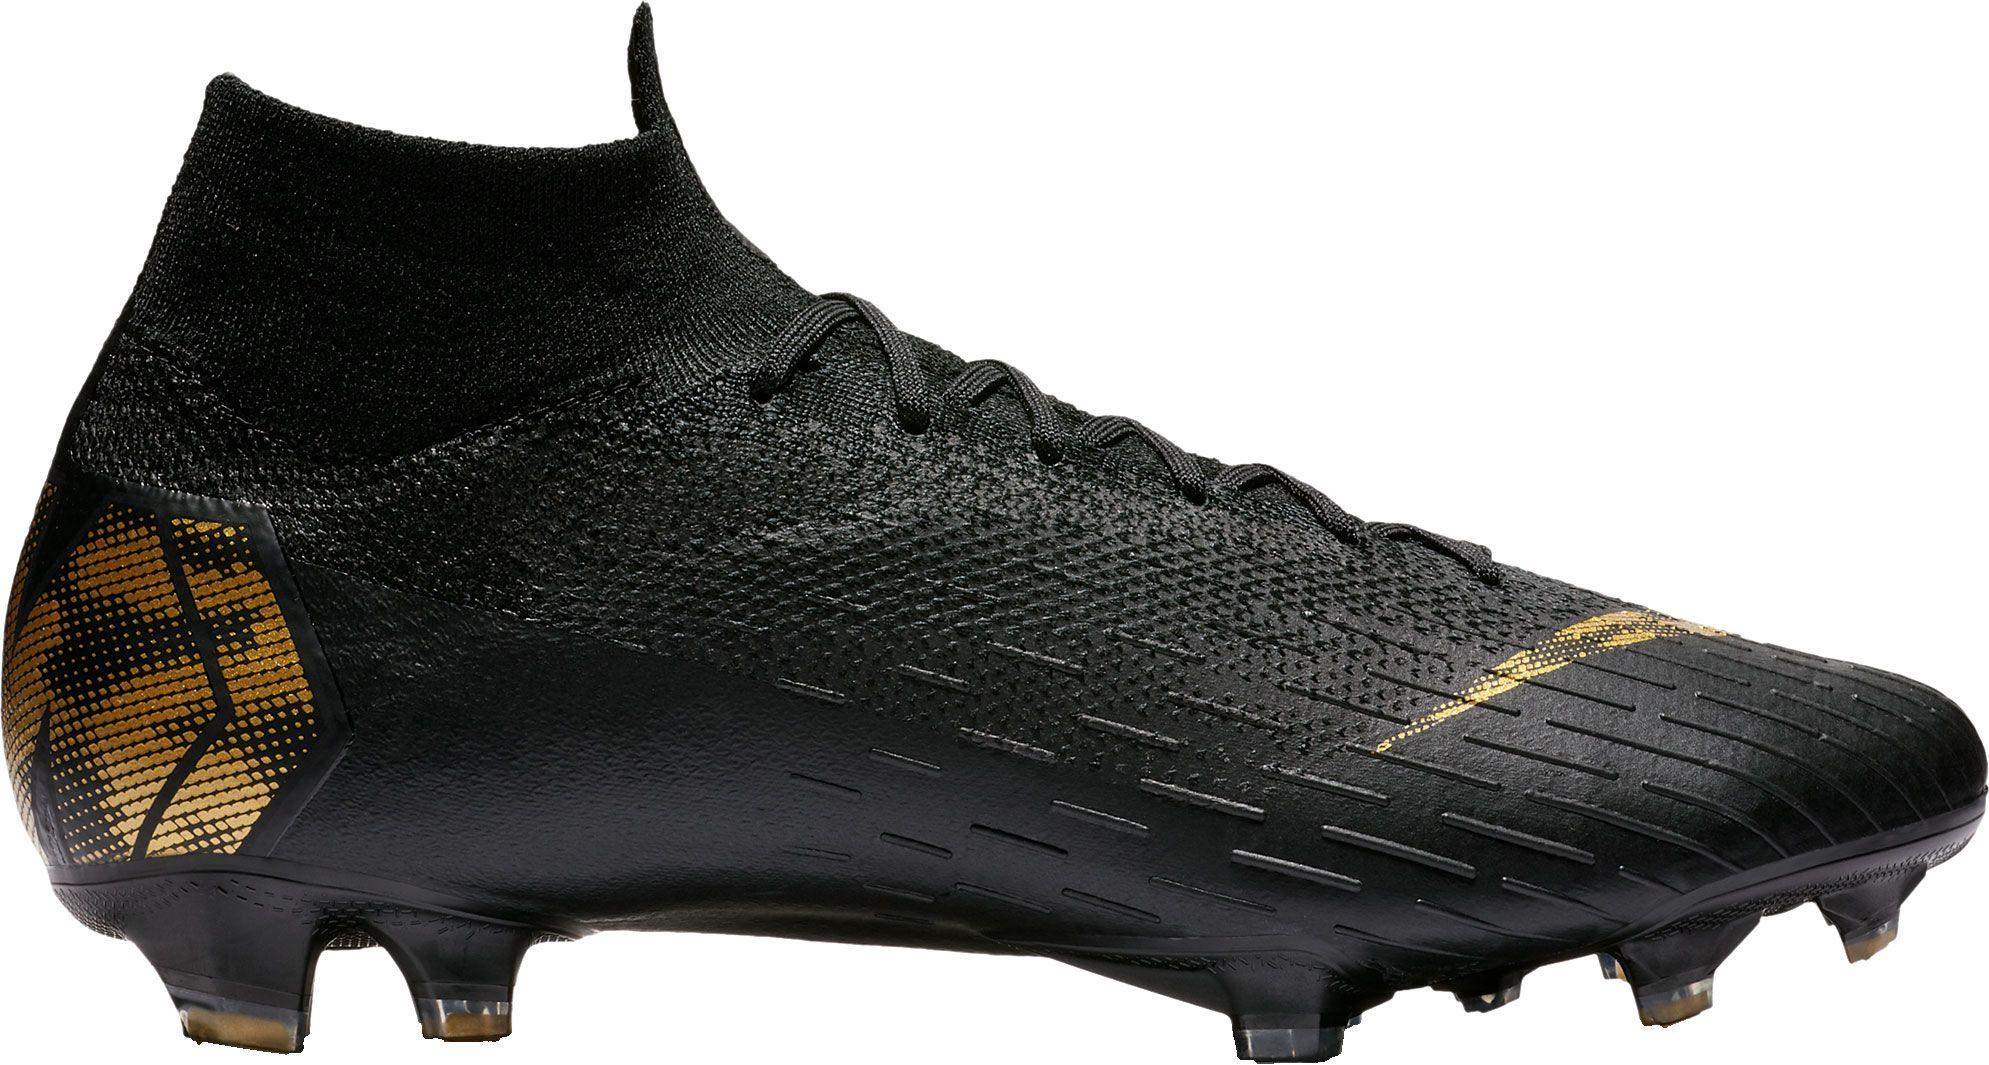 Nike Mercurial Superfly 360 Elite FG Soccer Cleats, Men's, Size: 4.5, Black